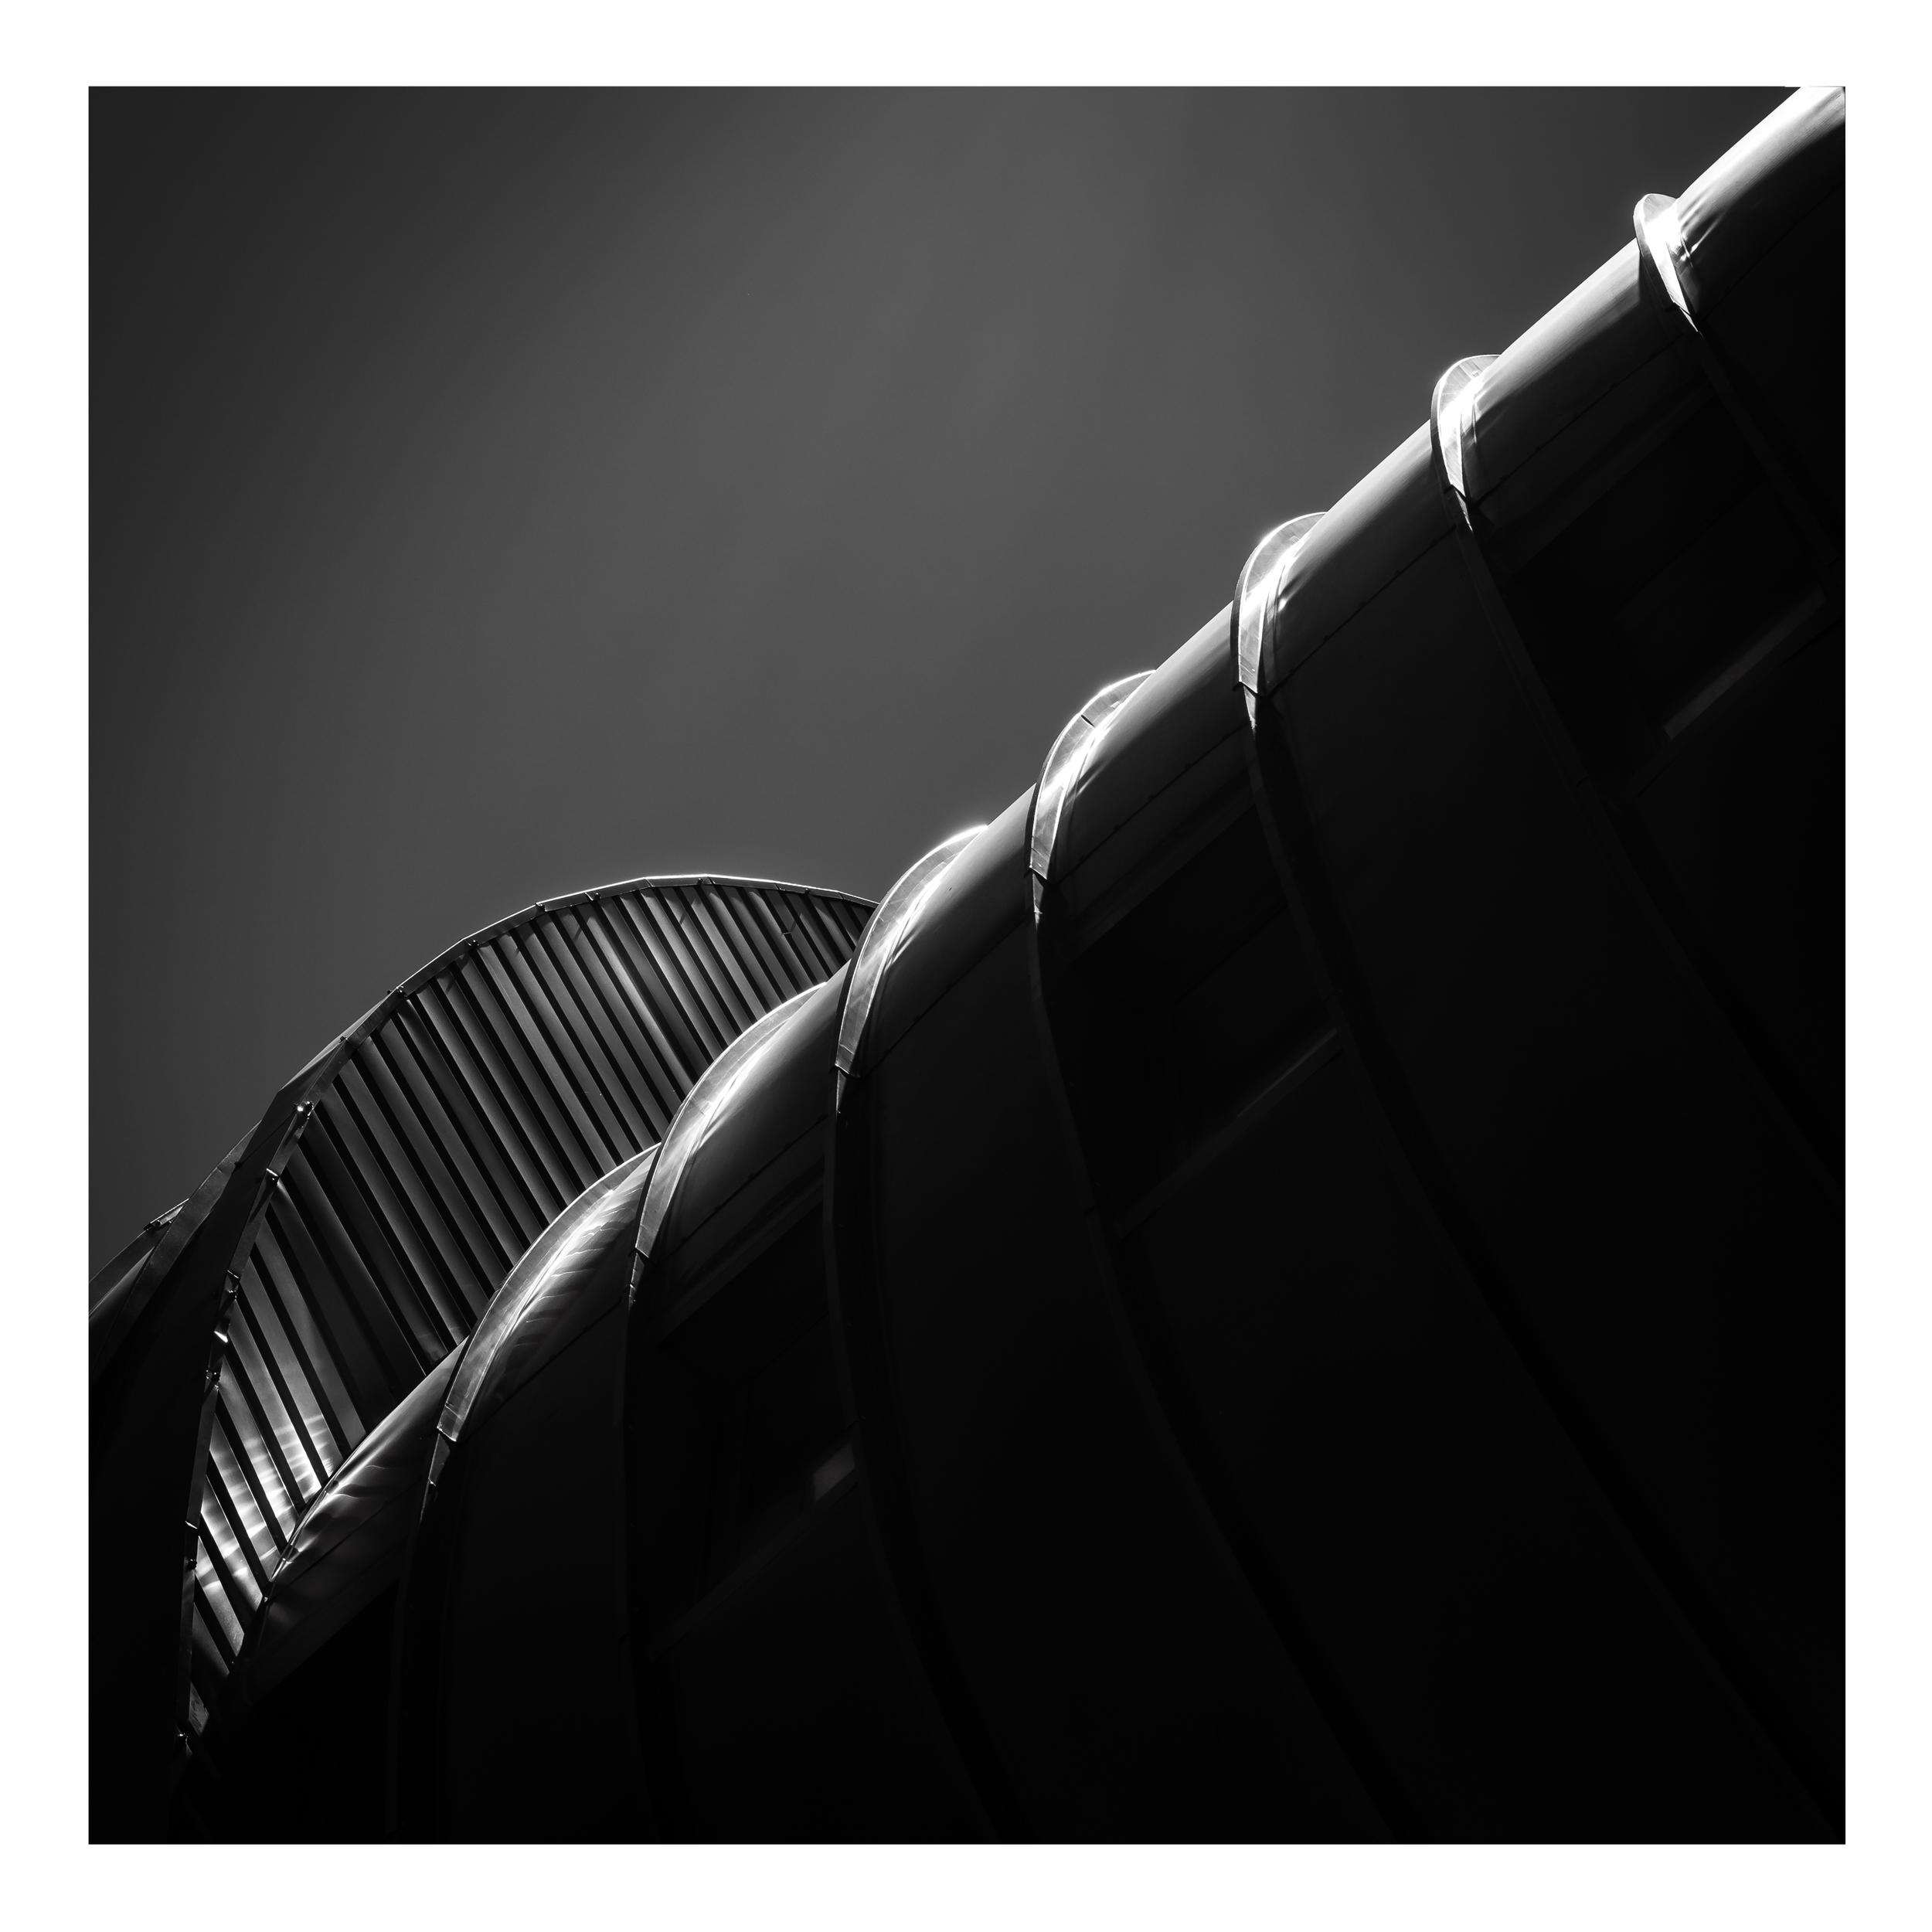 edge (net-zero energy building, Malaga)